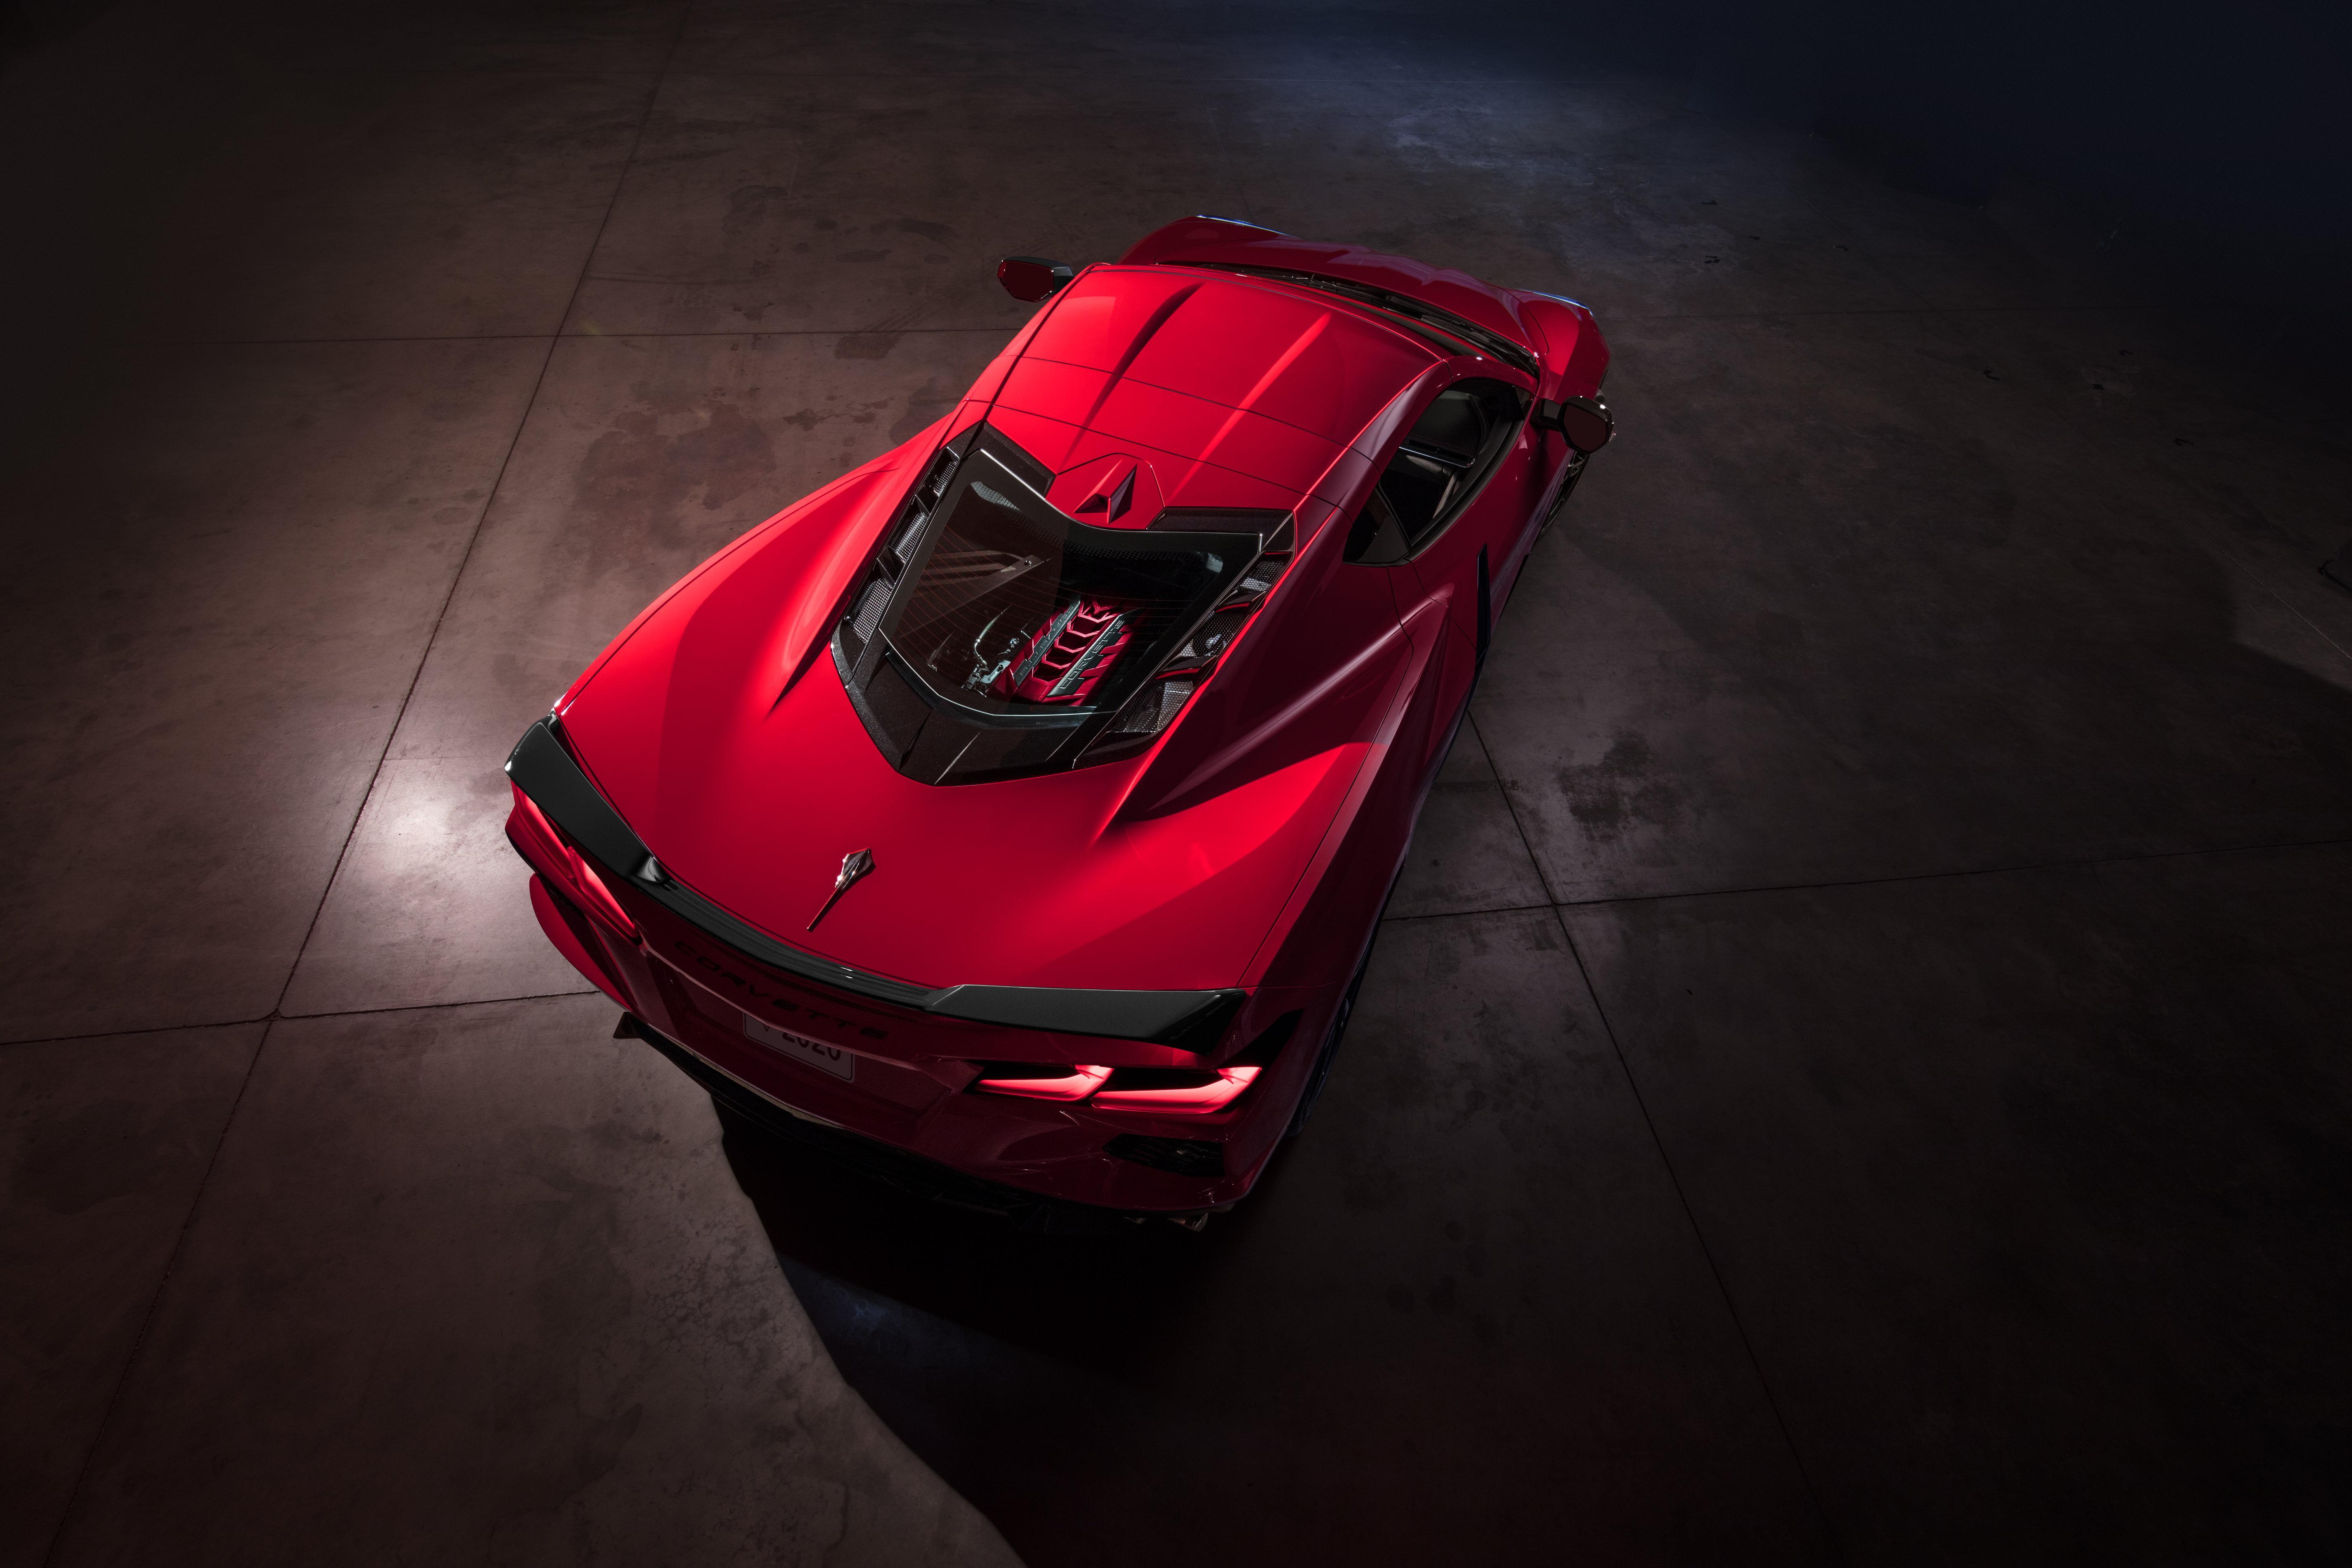 2020 Chevrolet Corvette General Motors Finally Unveils C8 Mid